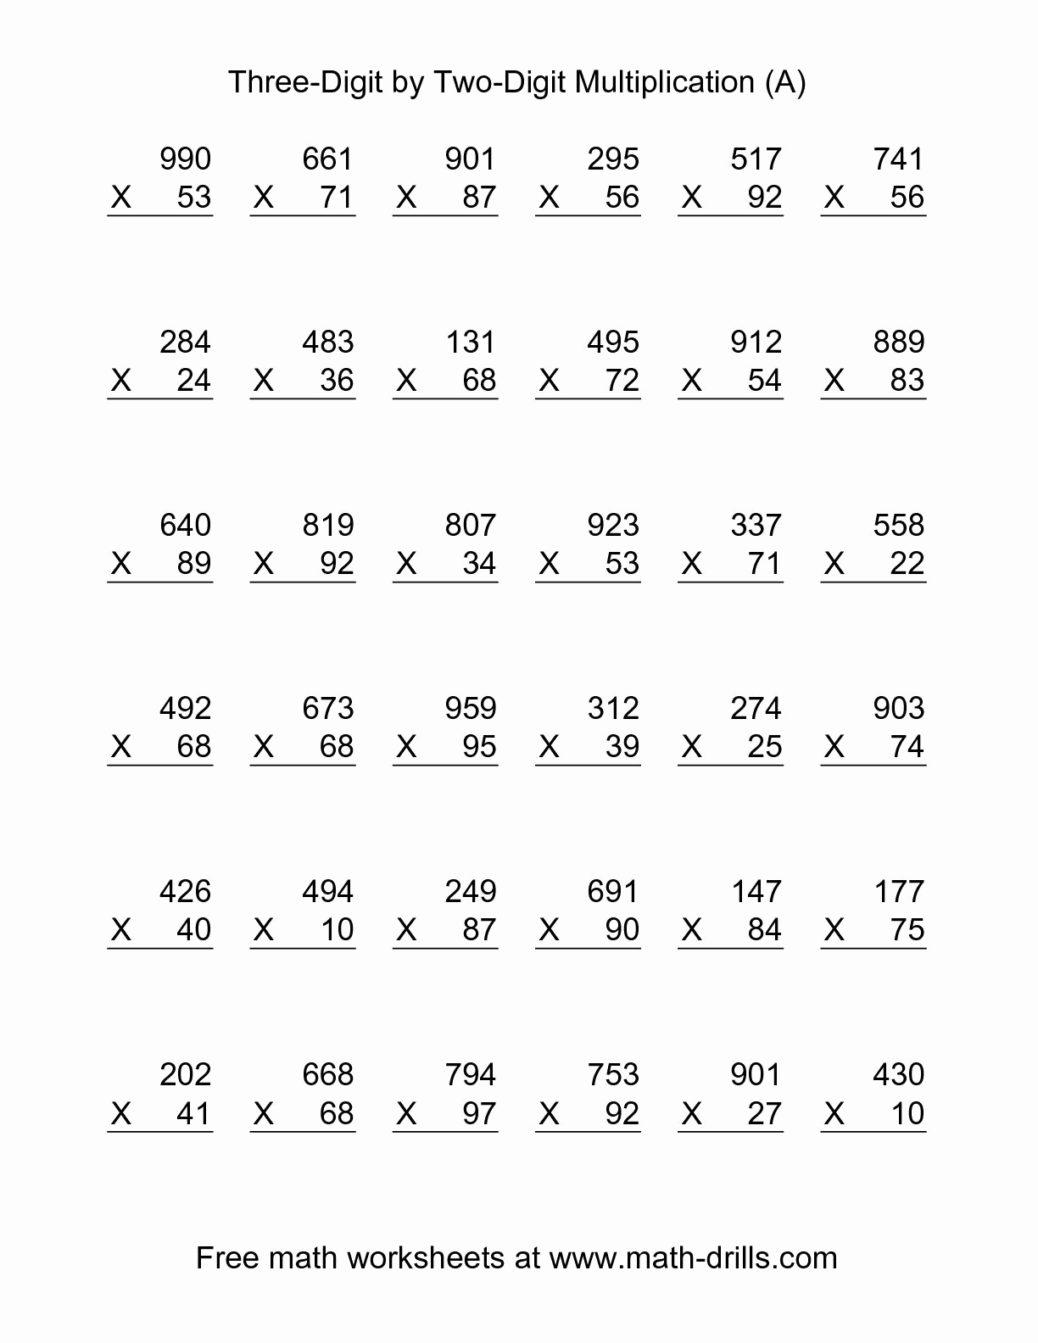 Free Double Digit Multiplication Worksheets Awesome Picture | Free Printable Double Digit Multiplication Worksheets